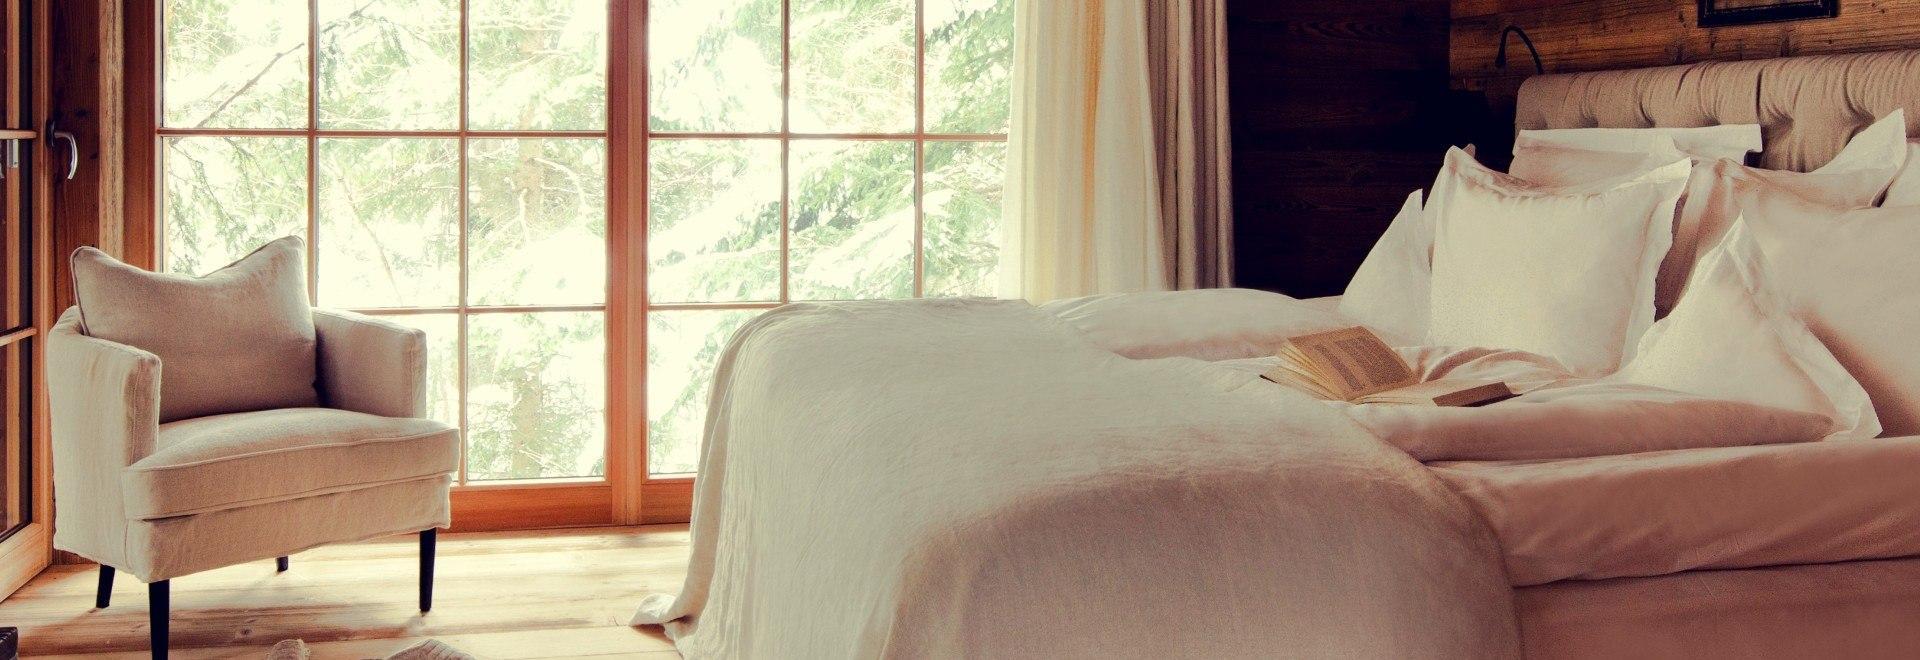 Alto Adige: Schloss Hotel Korb e San Luis